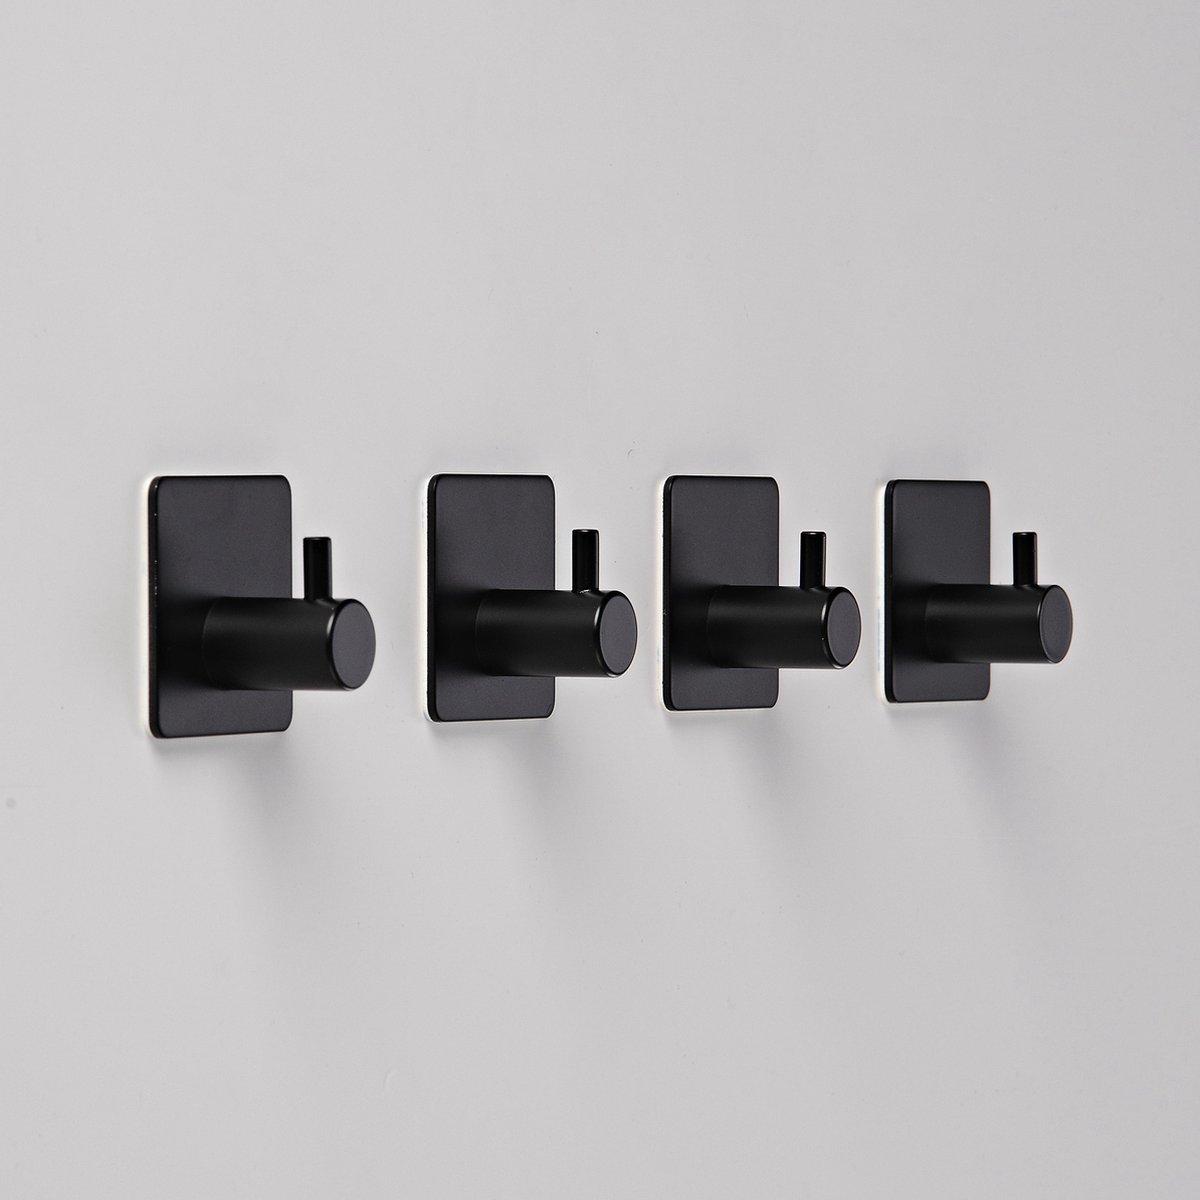 Handdoekhaakjes - Badkamer Zelfklevend   4 Stuks   RVS - Zwart